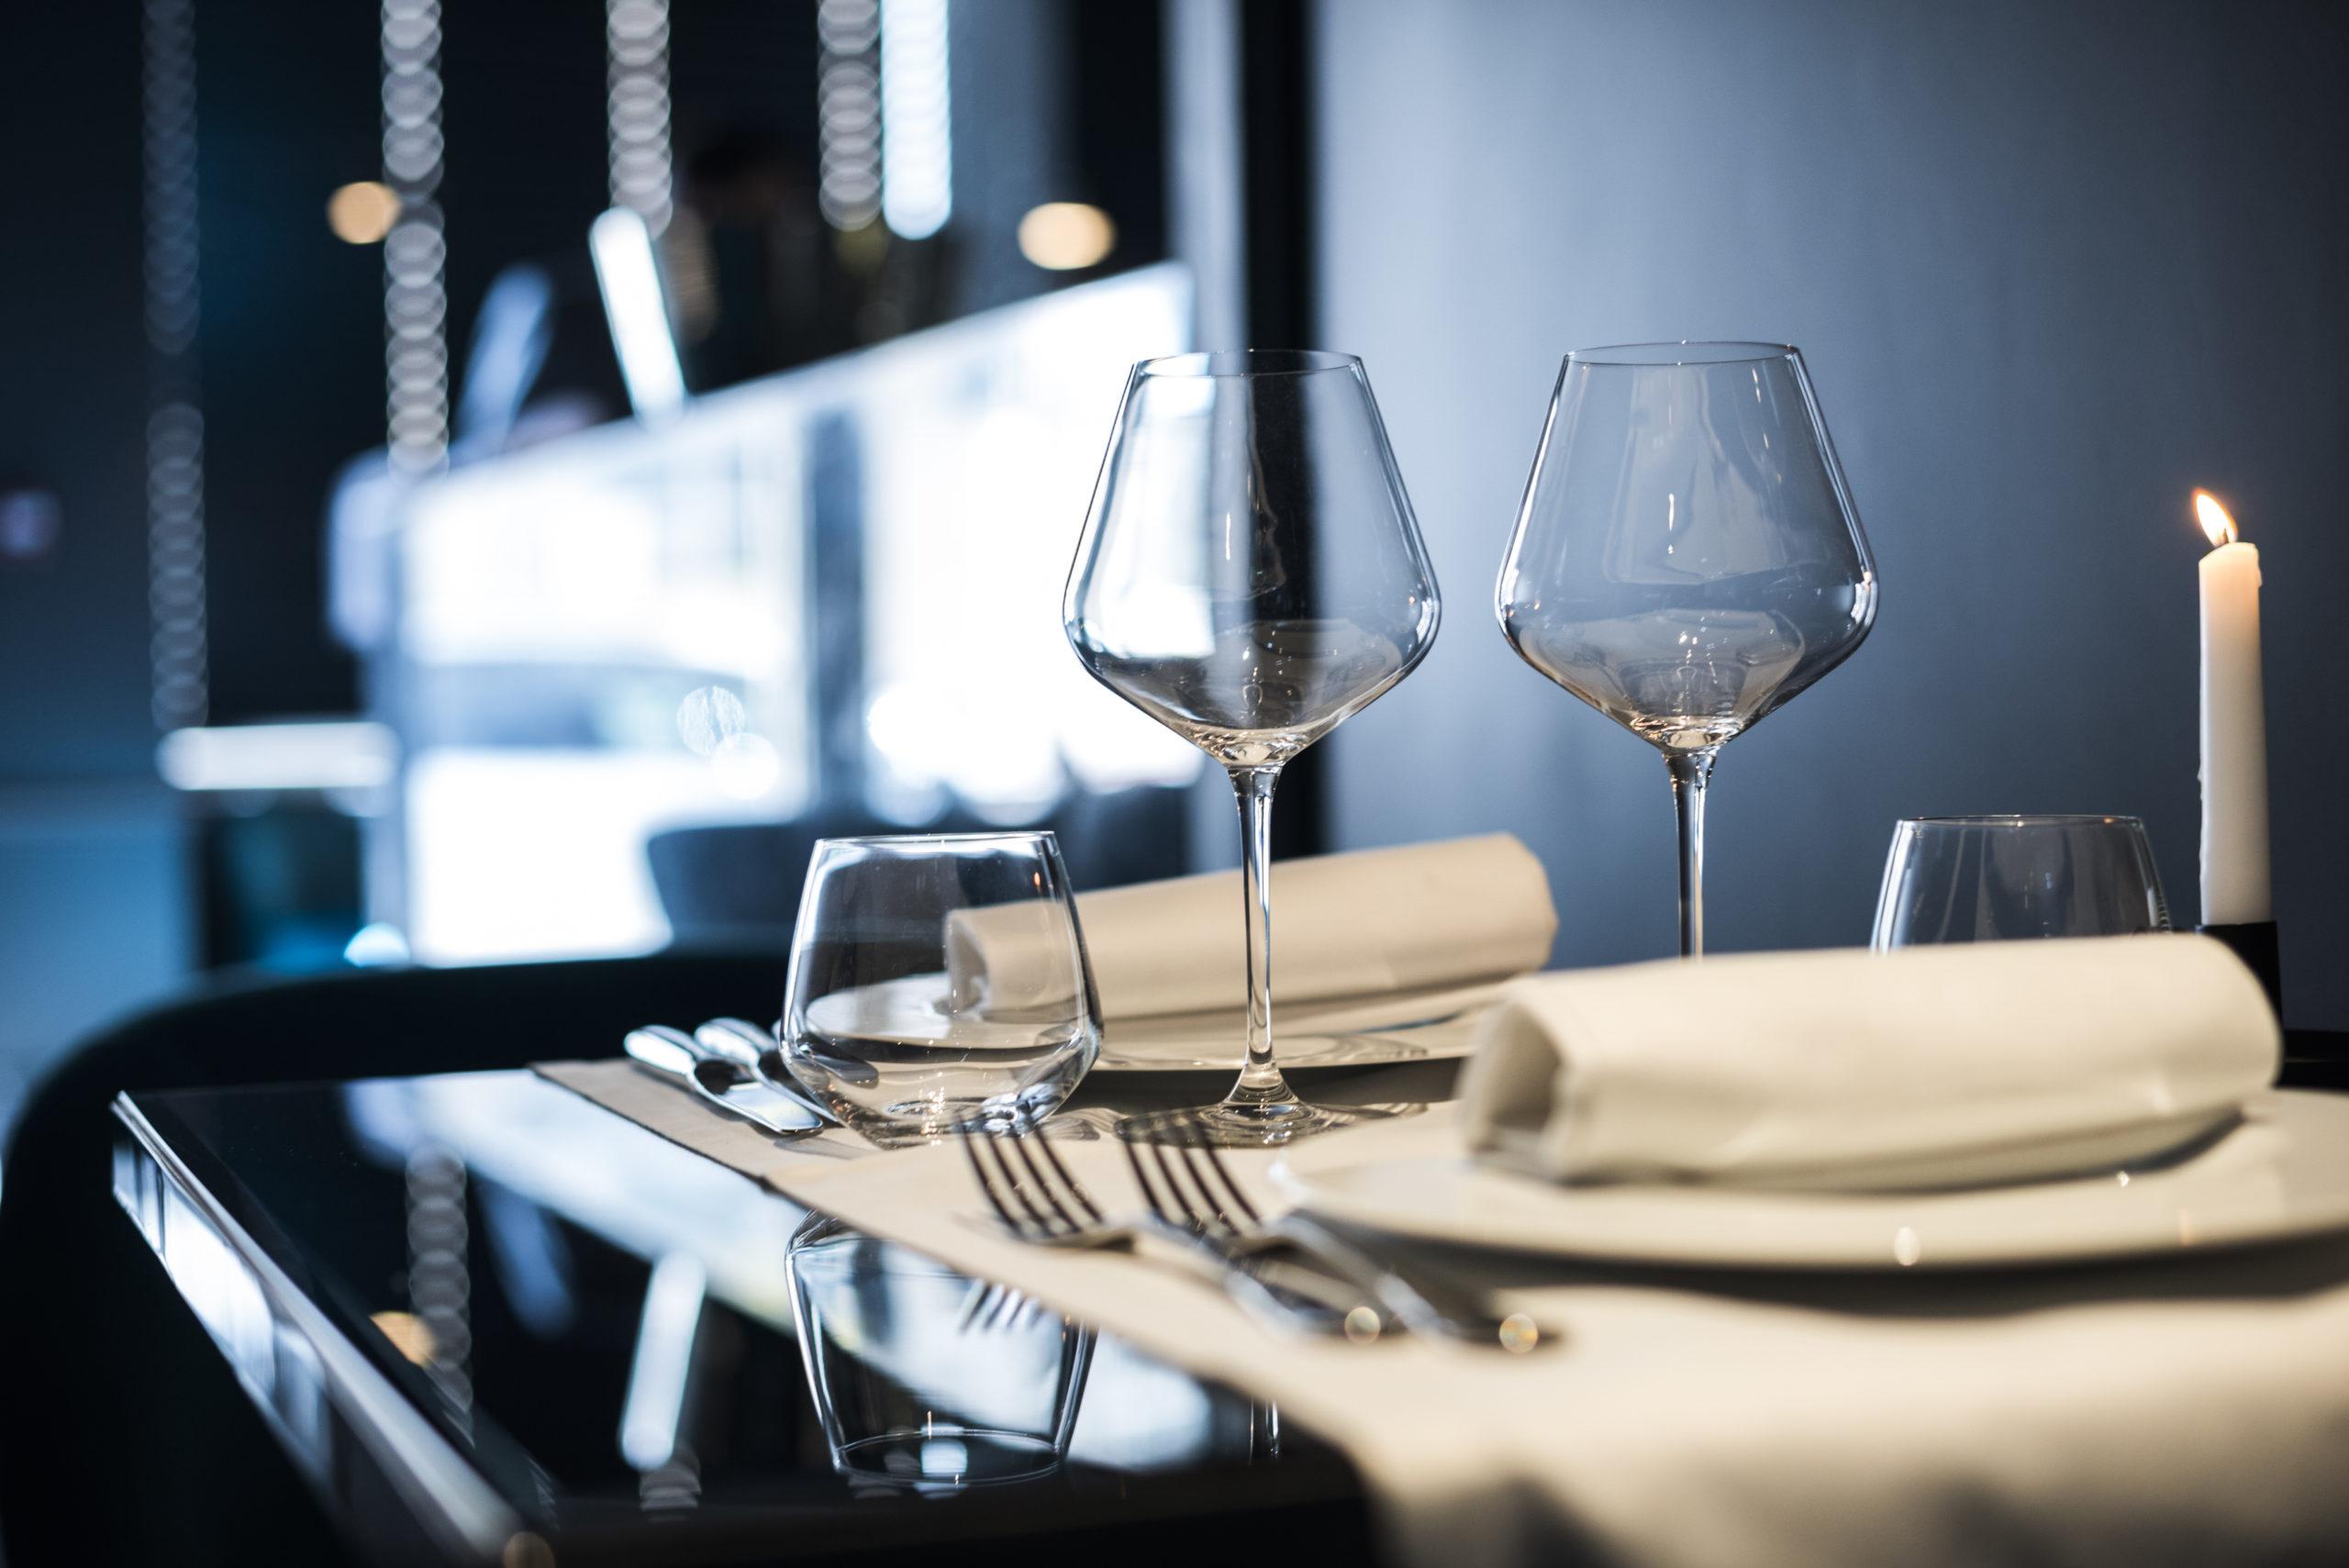 hôtel Boscolo Lyon 2 table restaurant